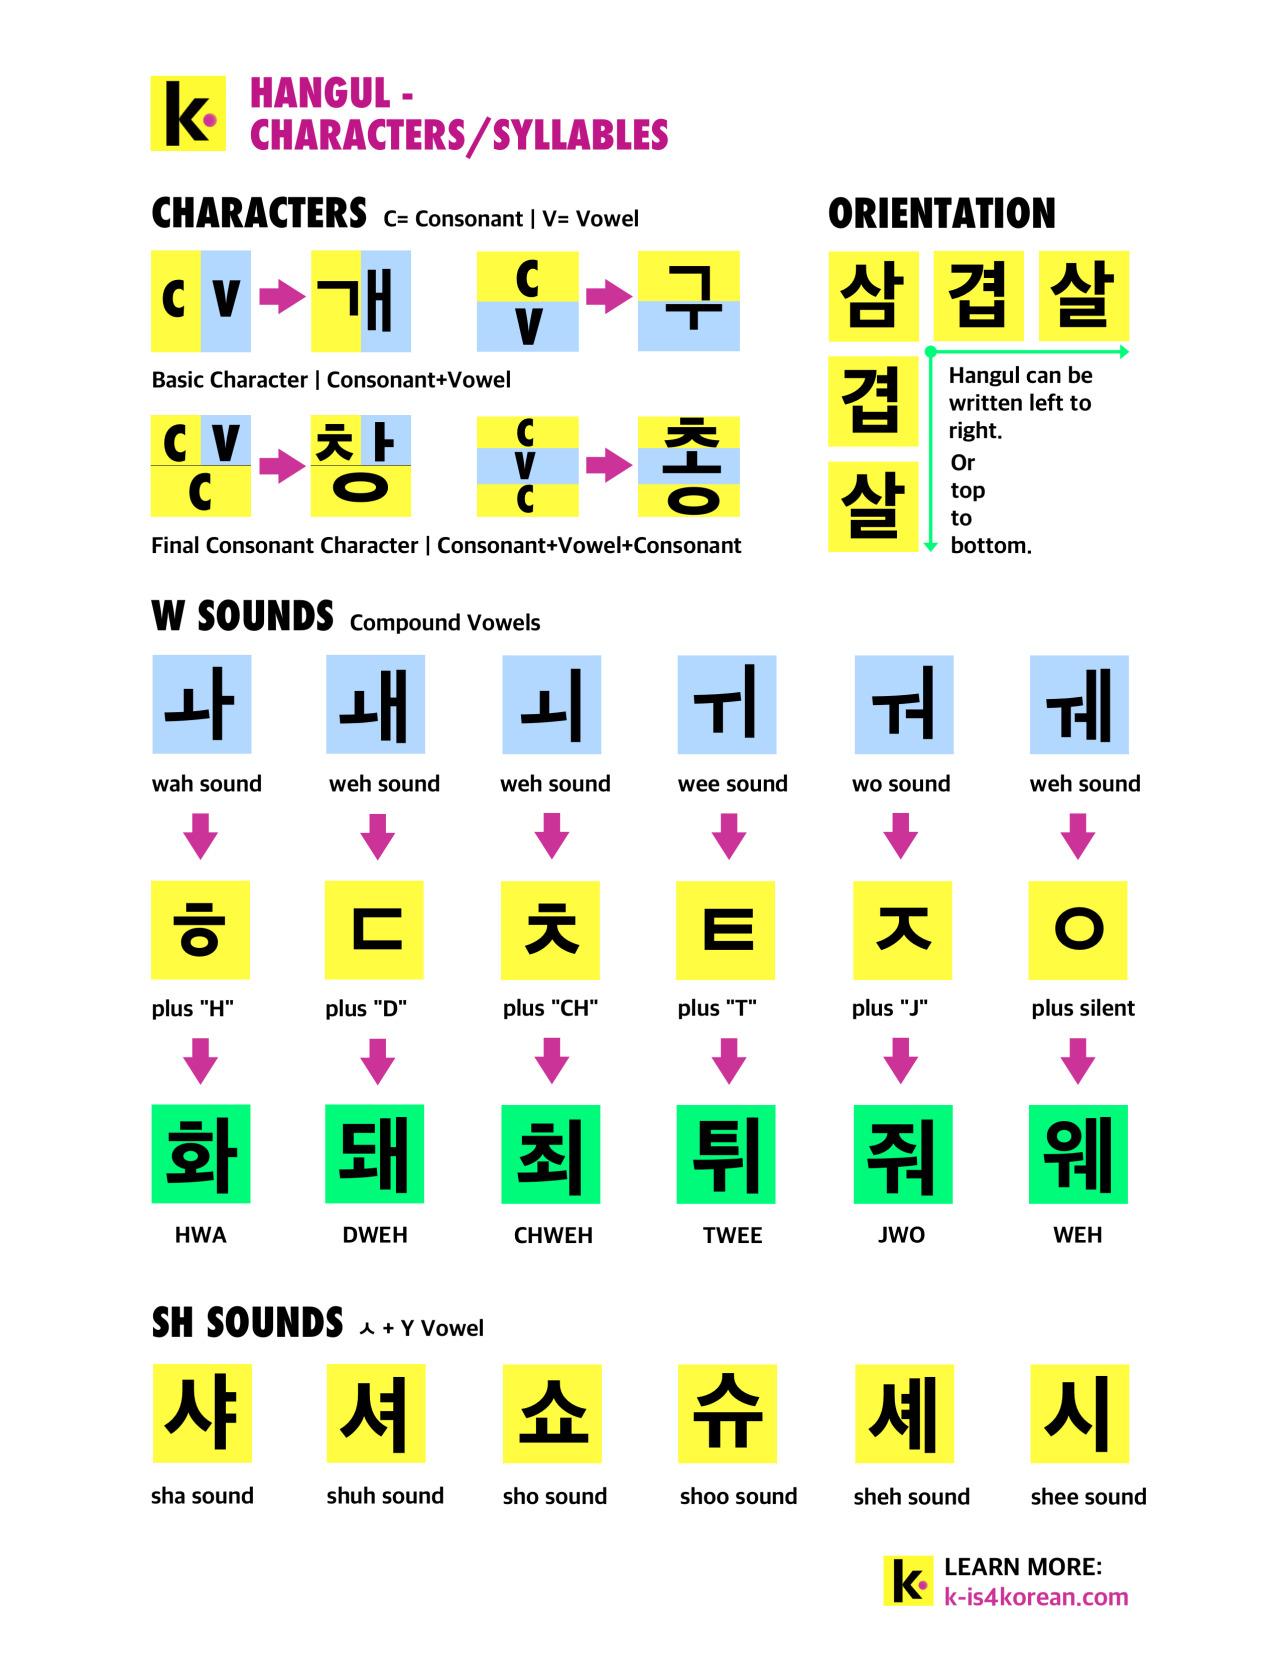 12 Days Of Hangul Masterpost Are You Beginning